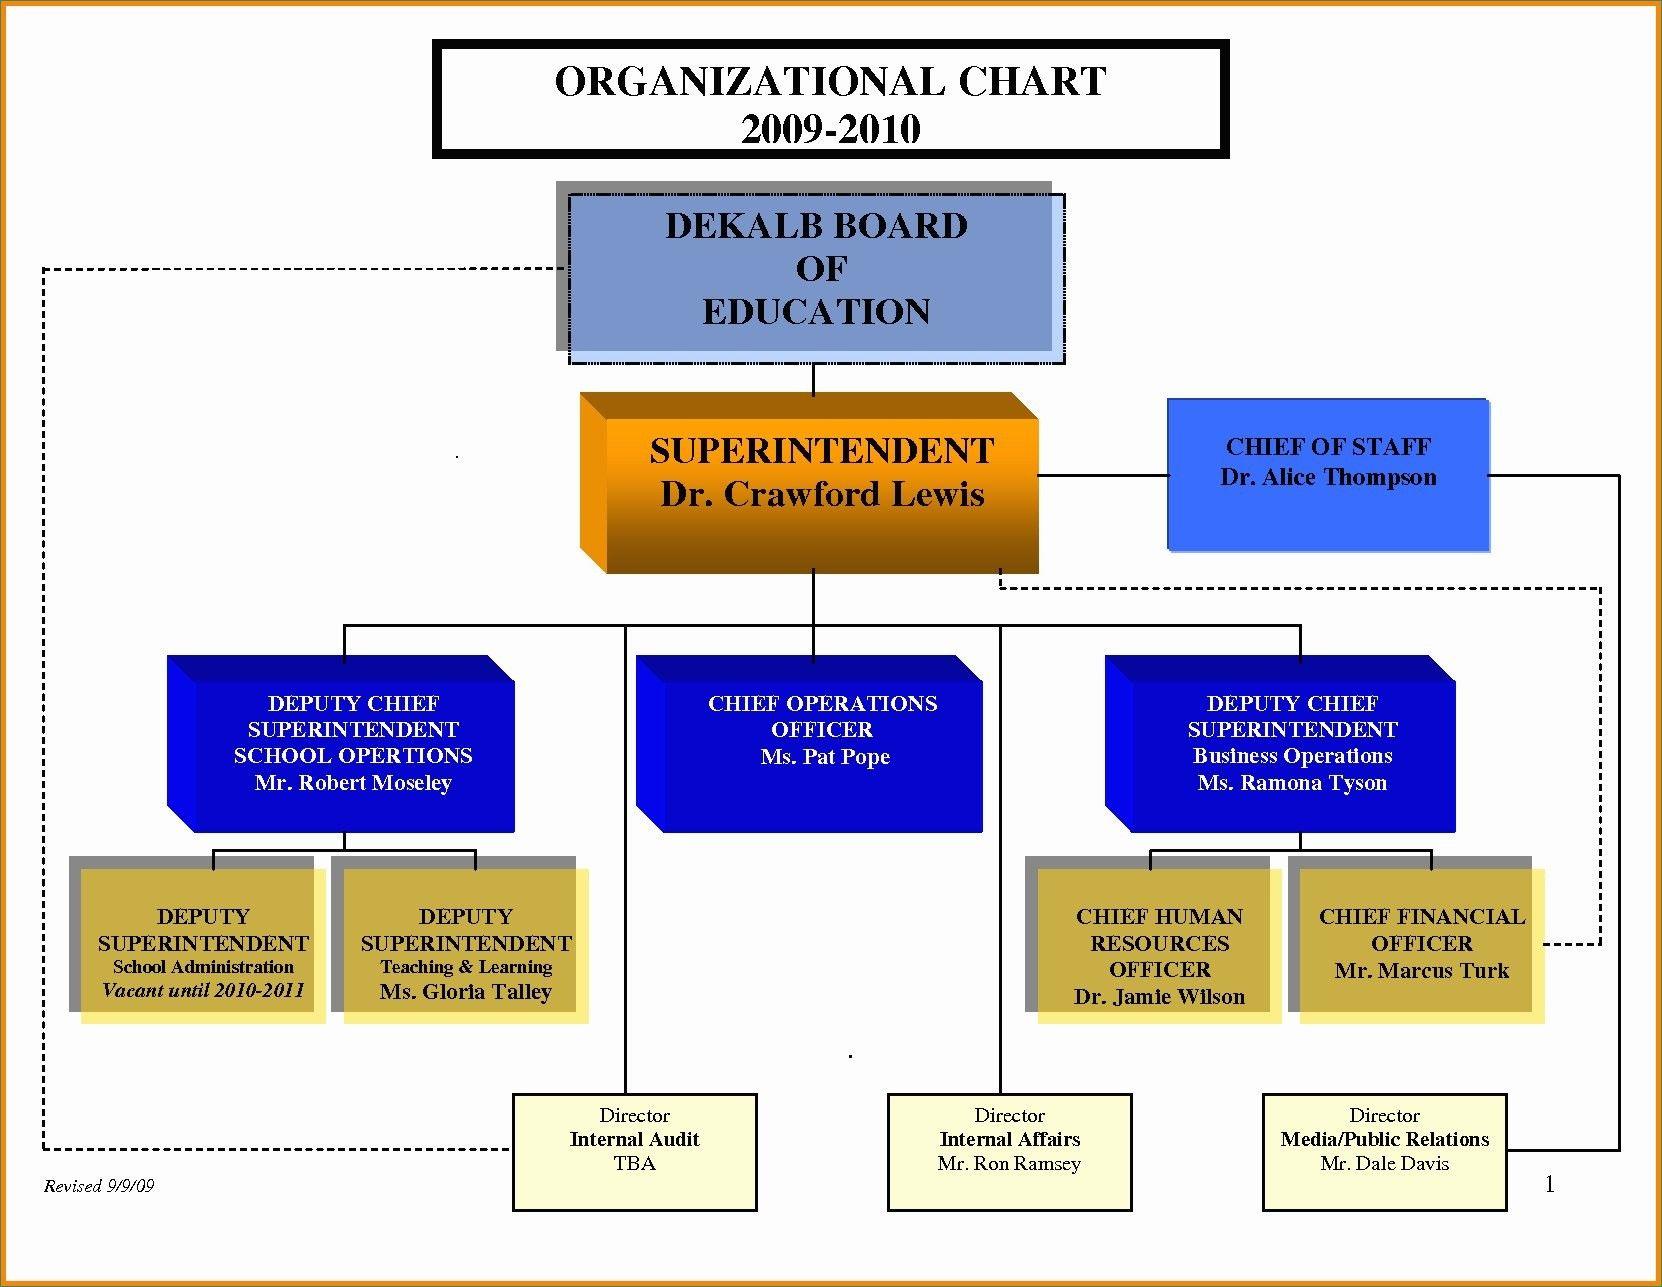 Unique Microsoft Organization Chart Templates Xls Xlsformat Xlstemplates Xlstemplate Check More At Https Organizational Chart Org Chart Organization Chart